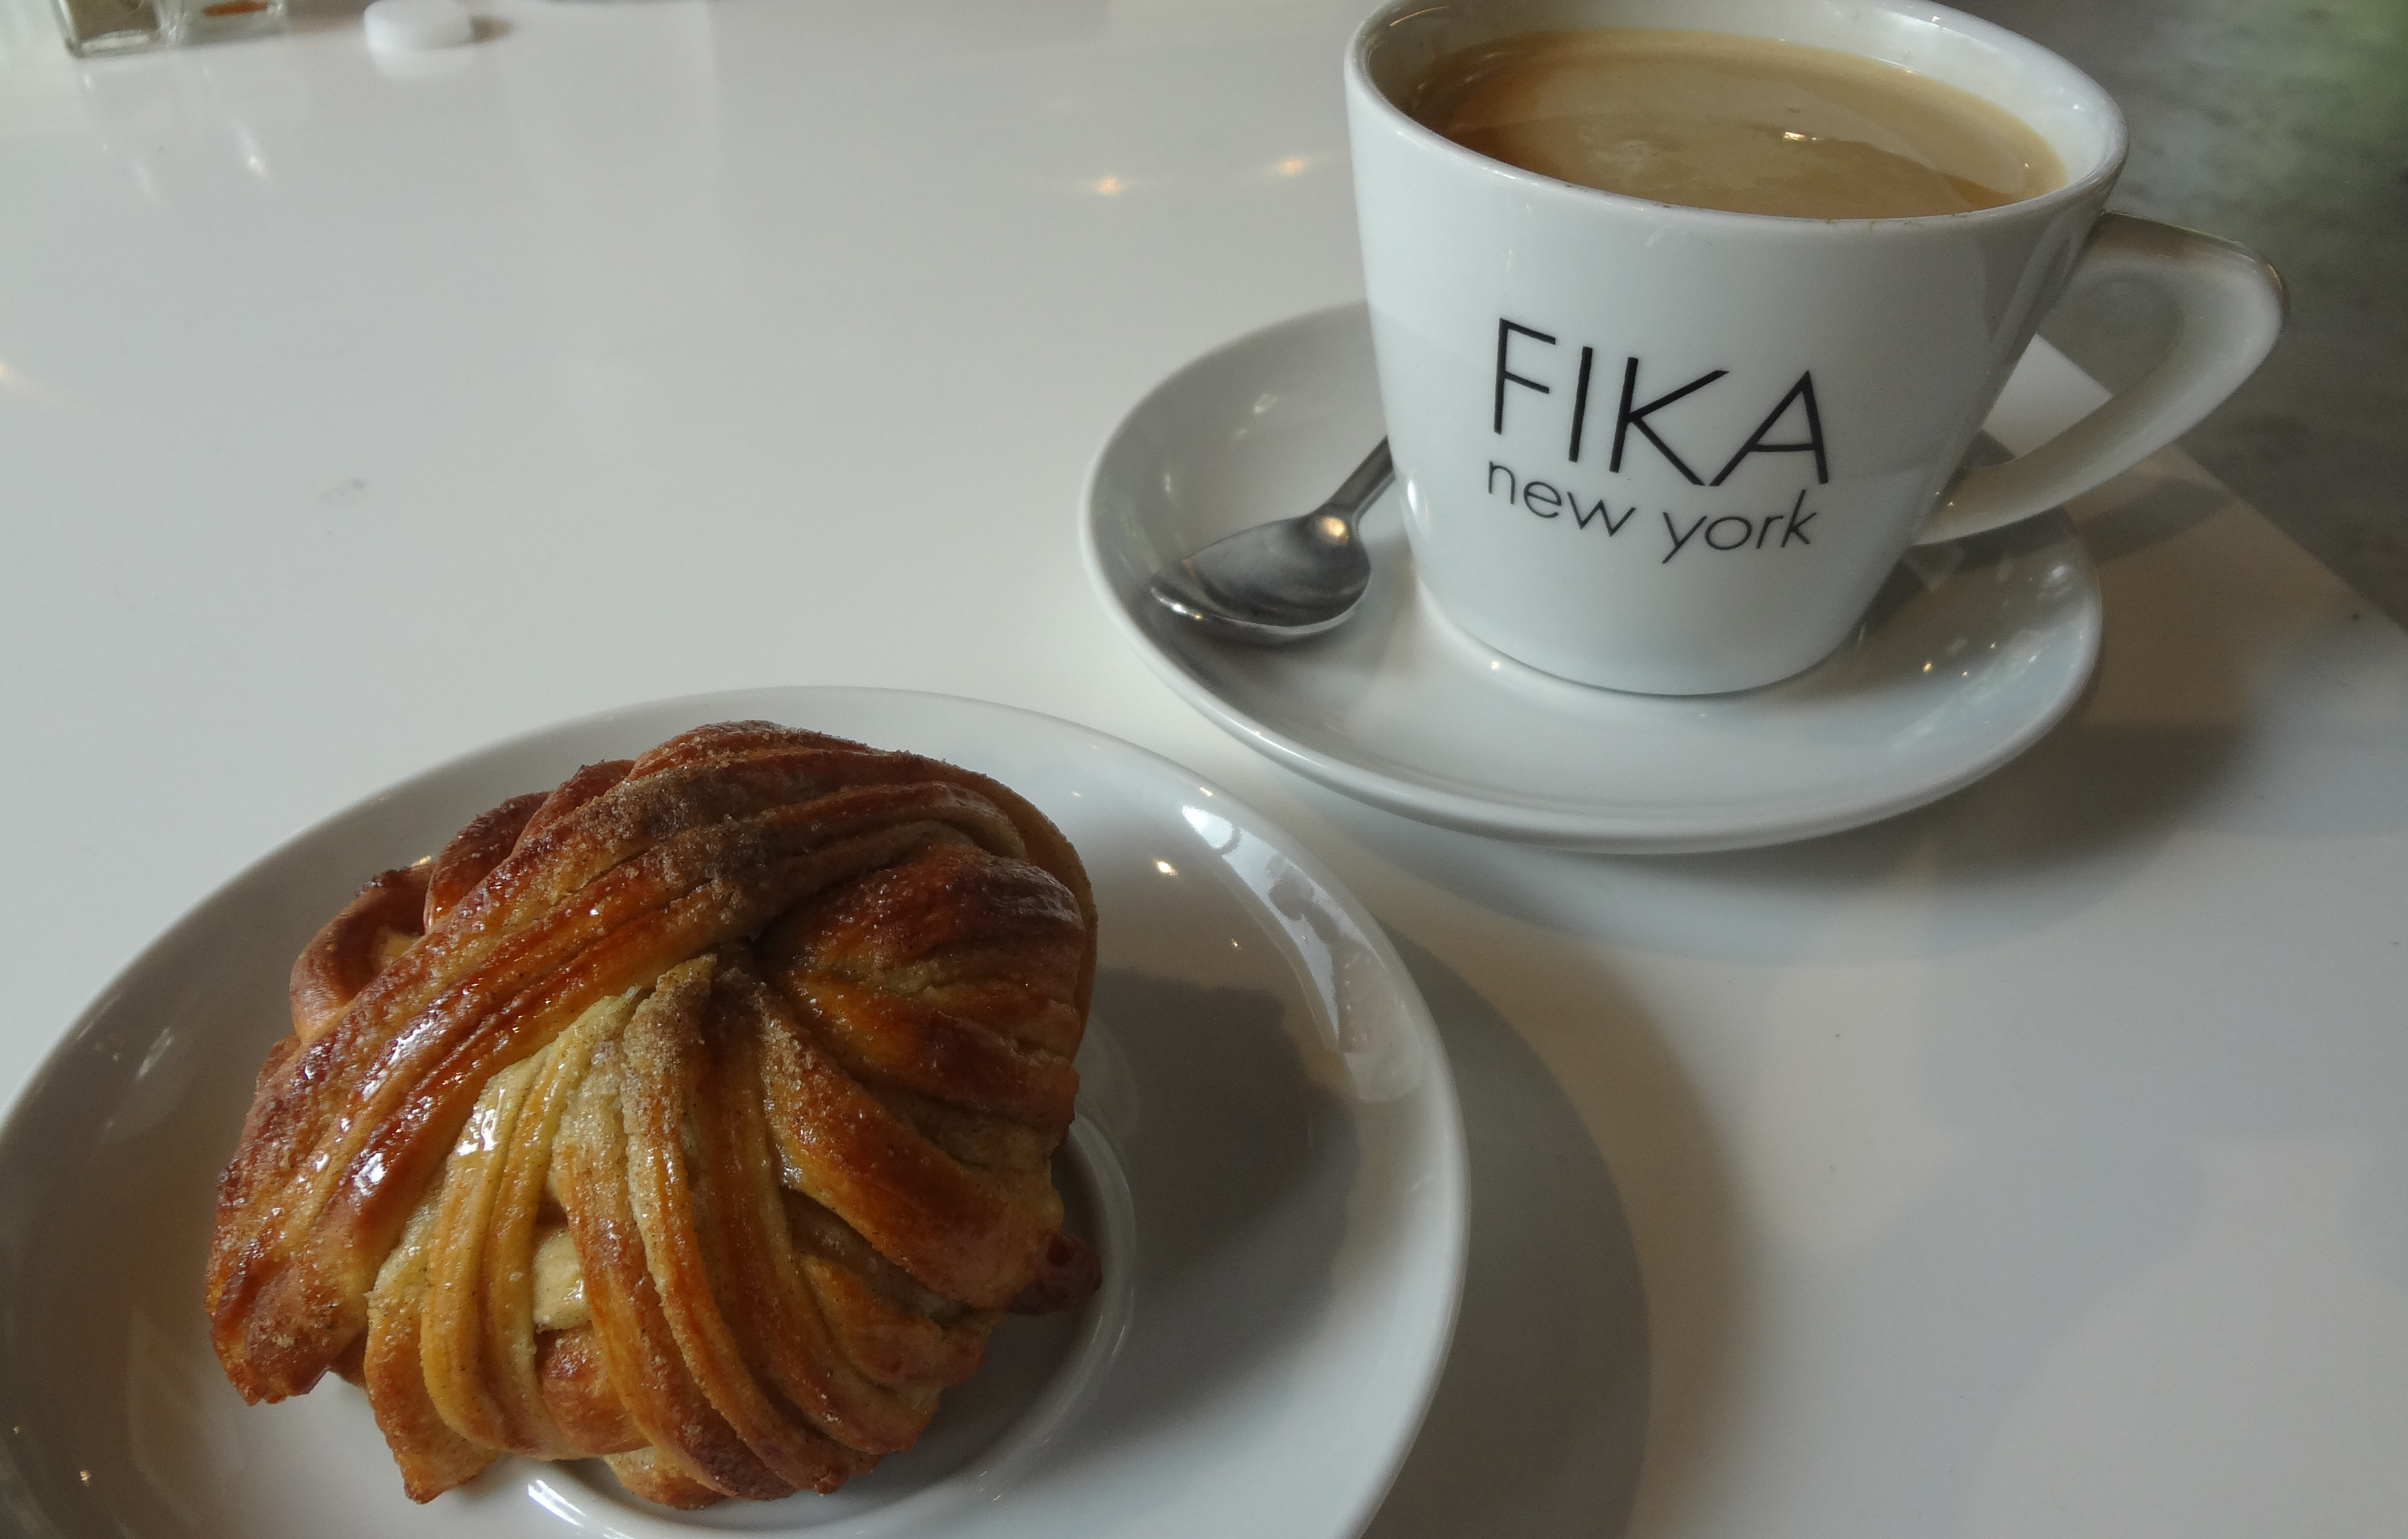 Cardamom at FIKA